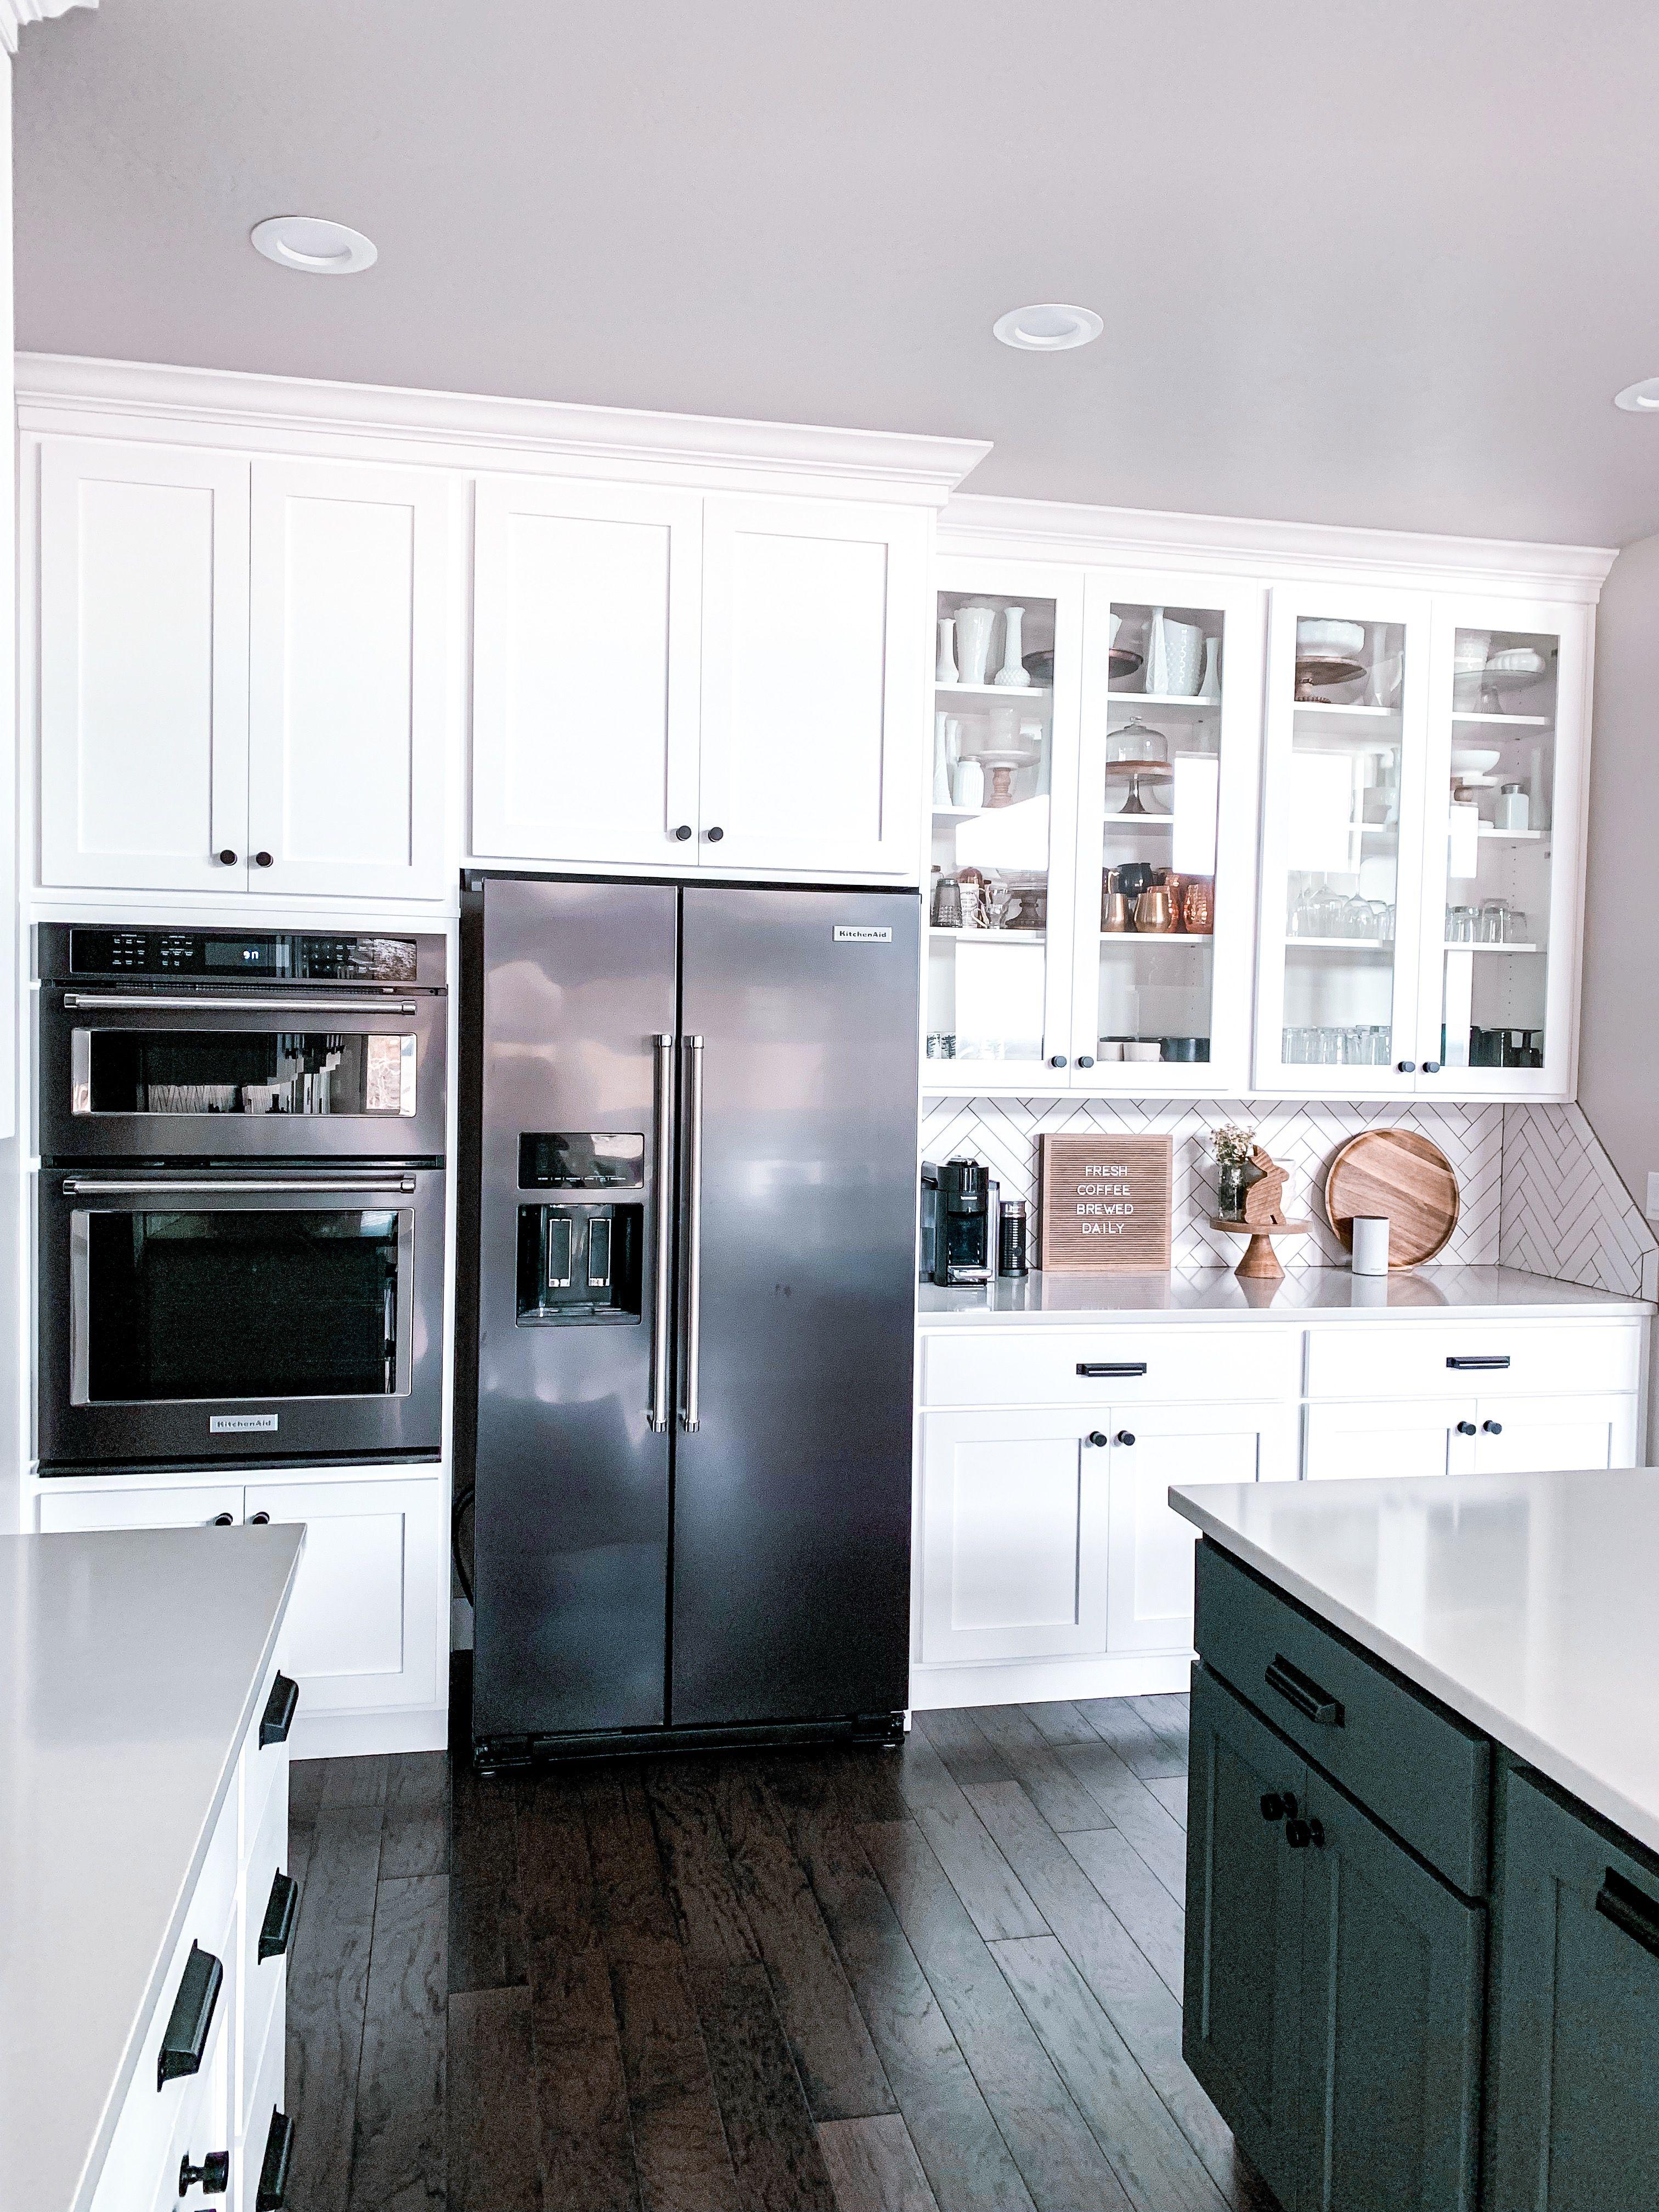 Our kitchen   White kitchen appliances, Kitchen remodel small ...